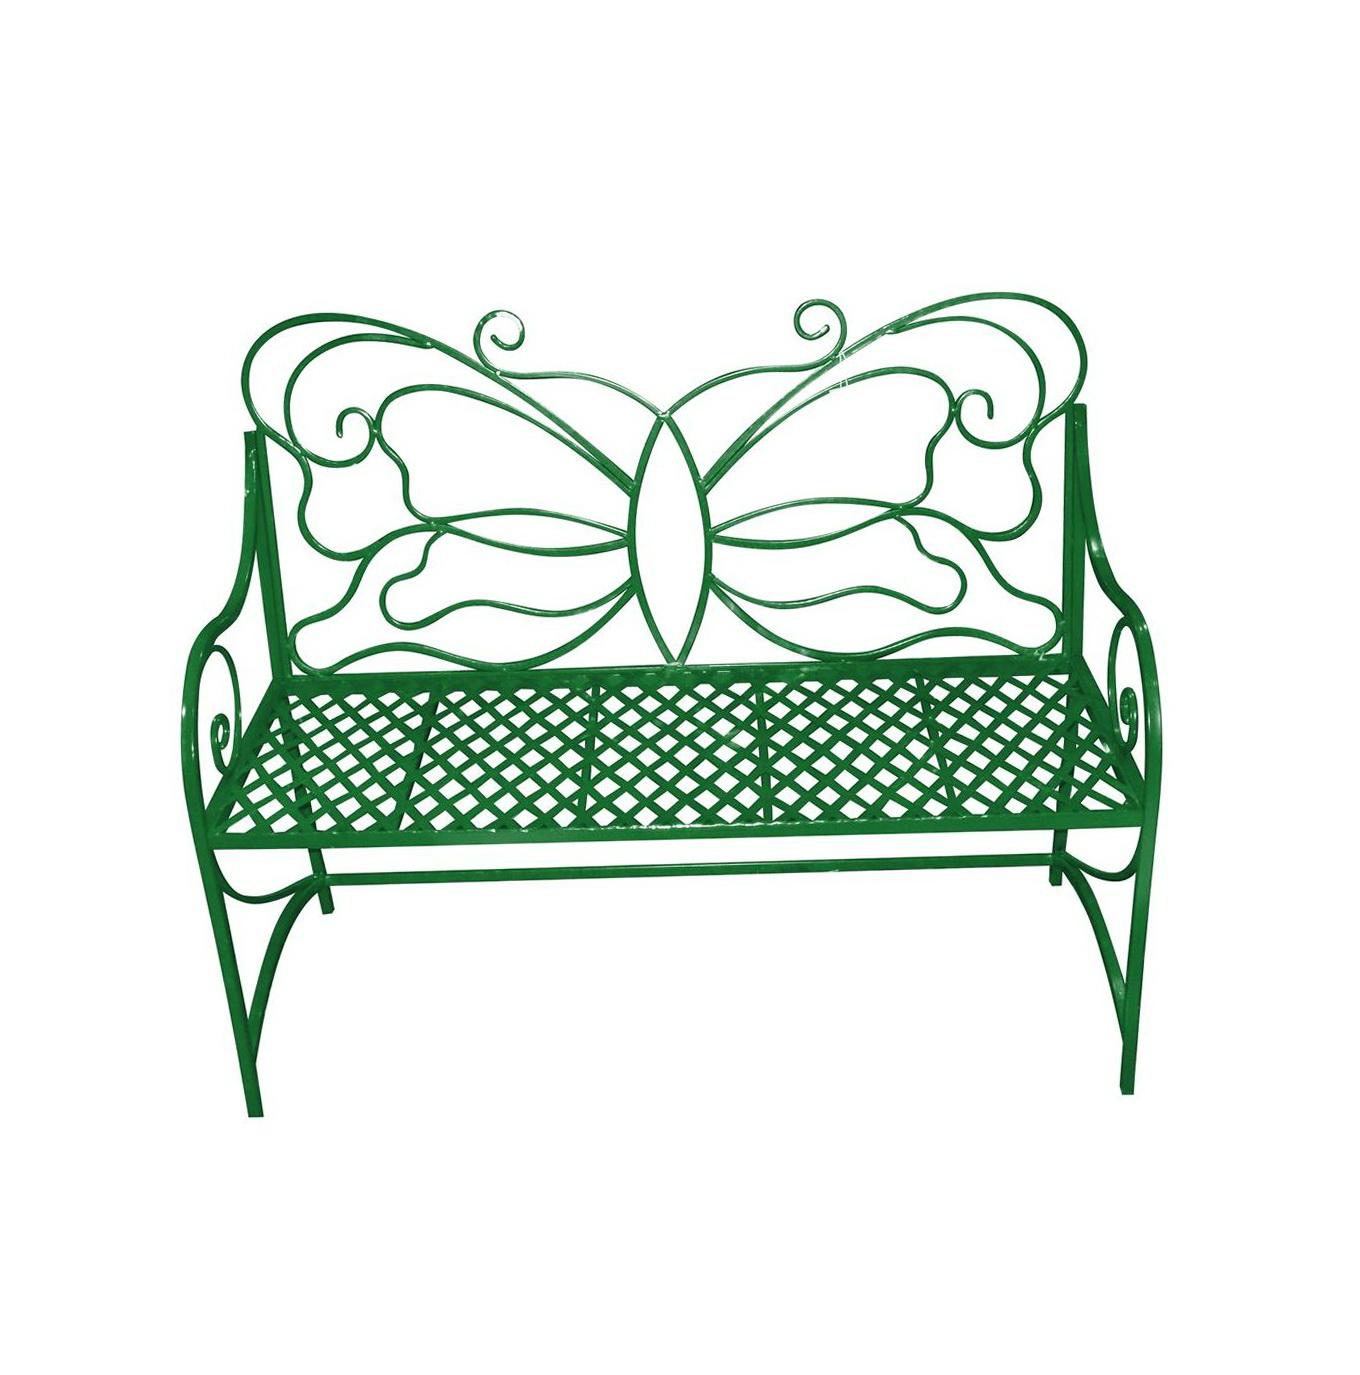 Green Metal Garden Bench